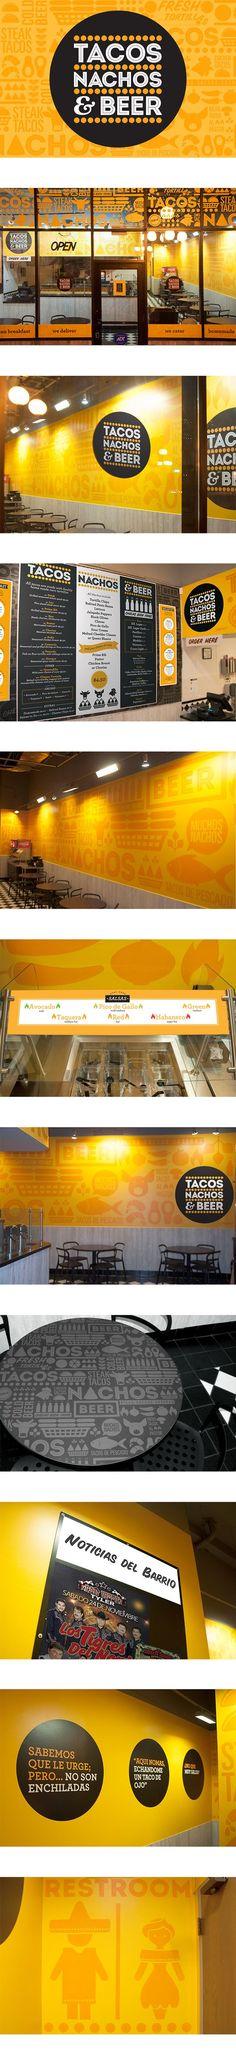 Tacos Nachos and Beer Restaurant Branding on Behance | Fivestar Branding – Design and Branding Agency & Inspiration Gallery